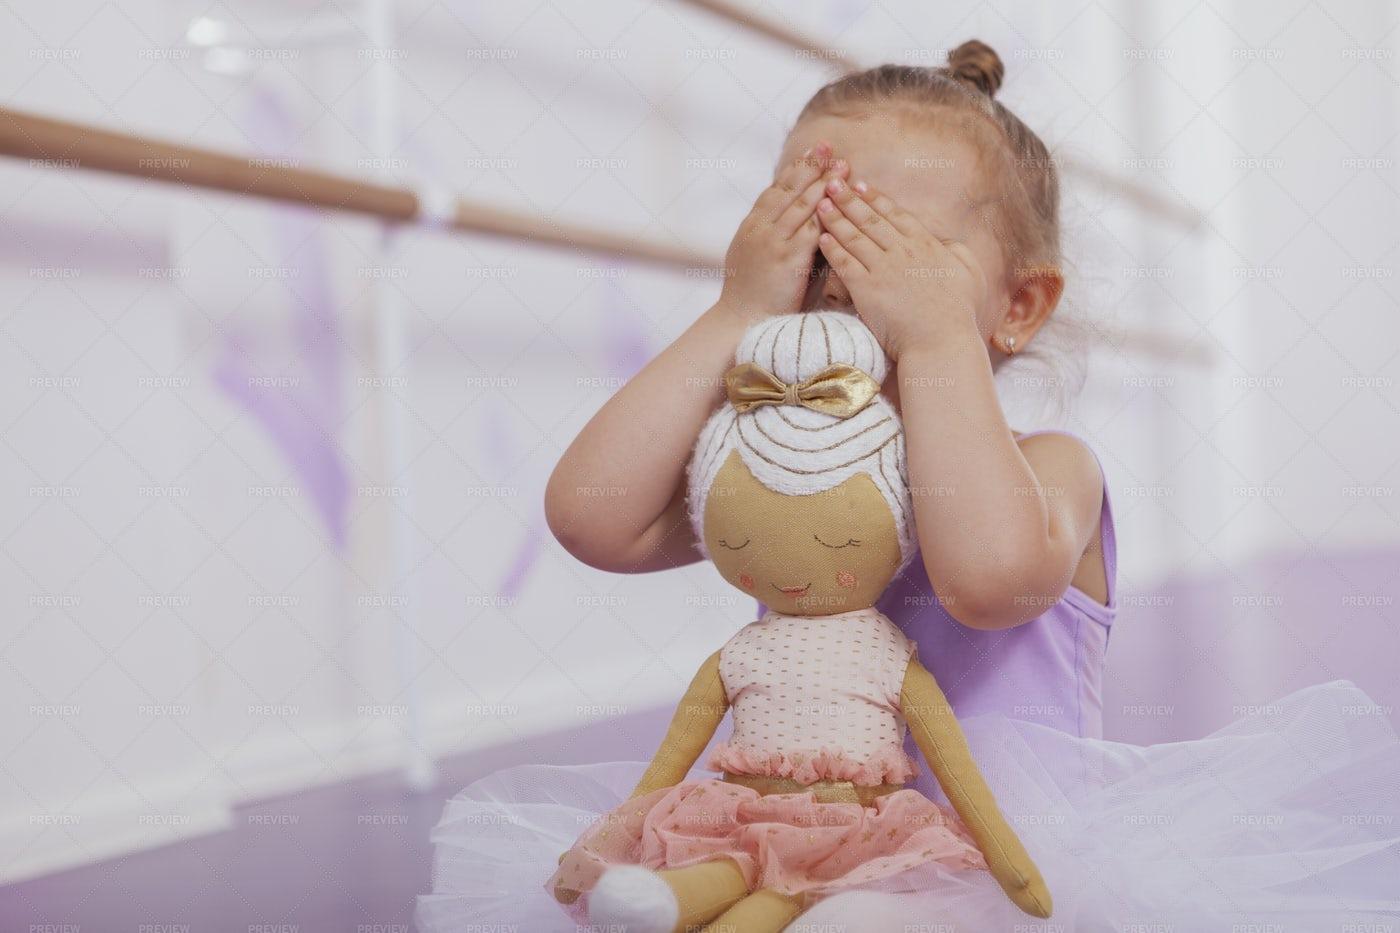 Ballerina With Toy Doll: Stock Photos